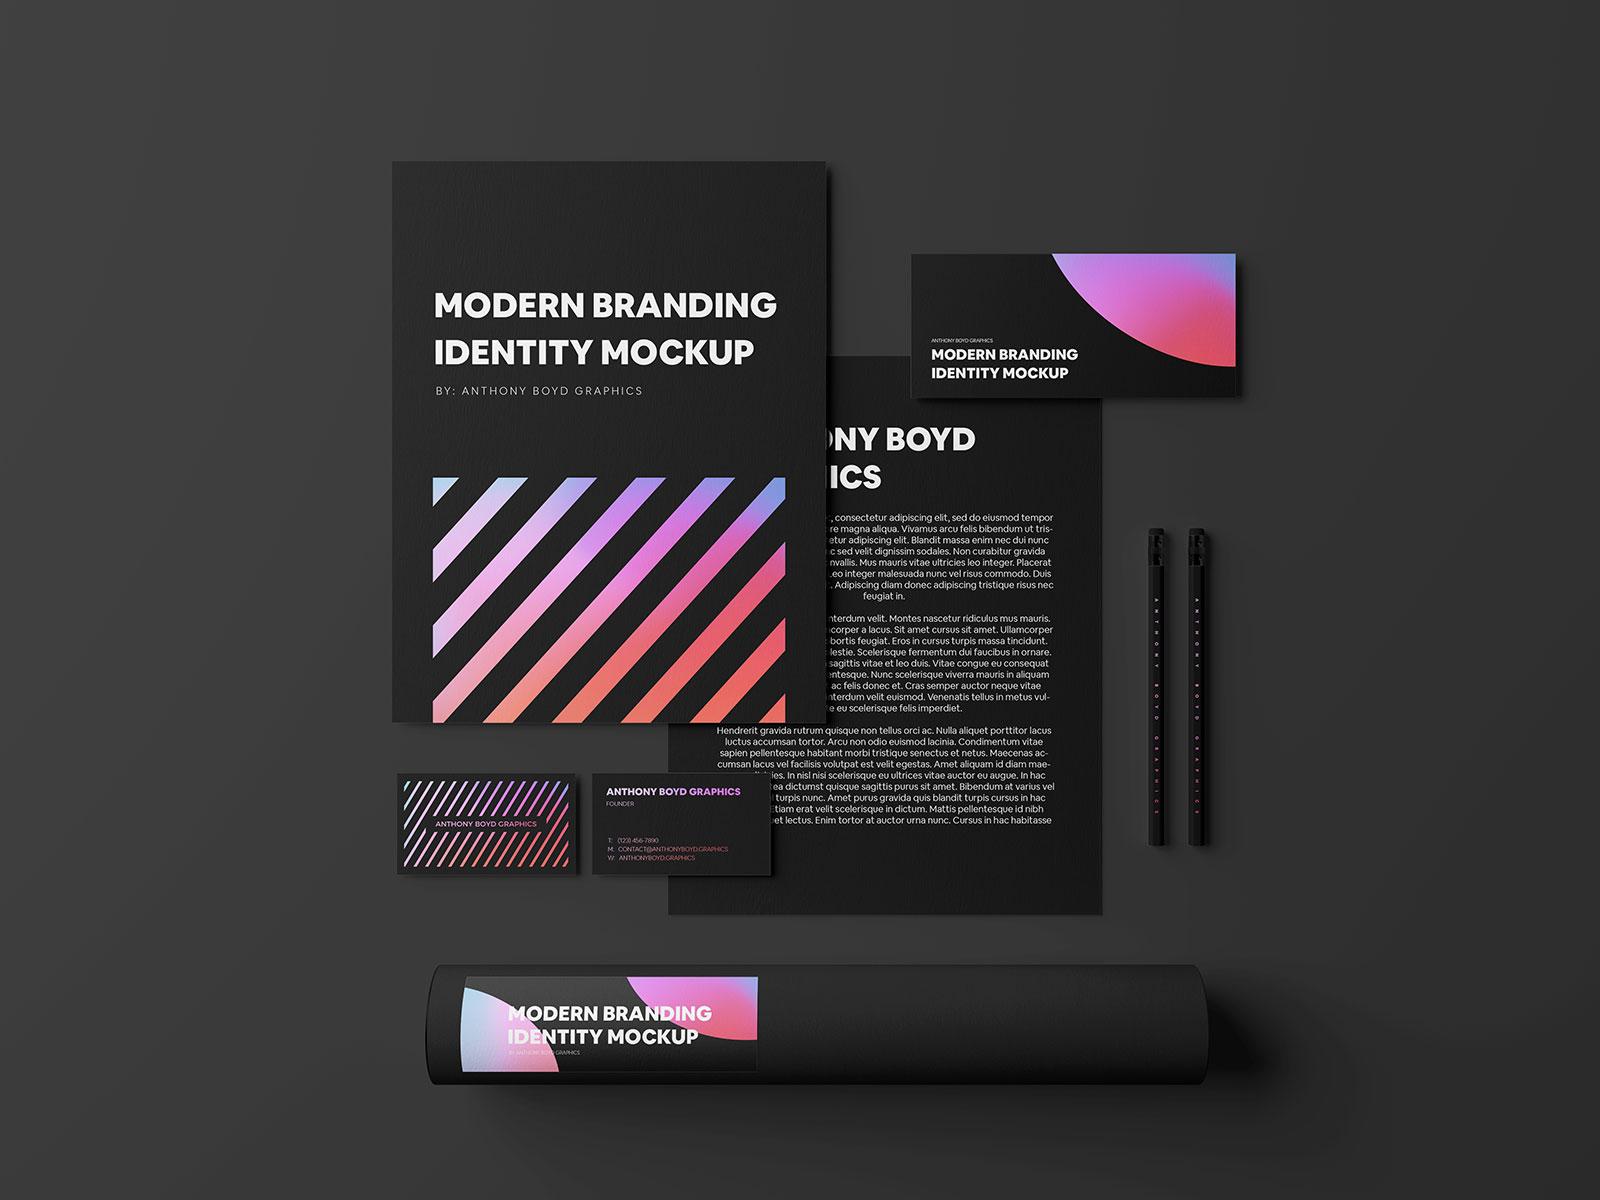 Free-Black-Stationery-Corporate-Brand-Identity-Mockup-PSD-2